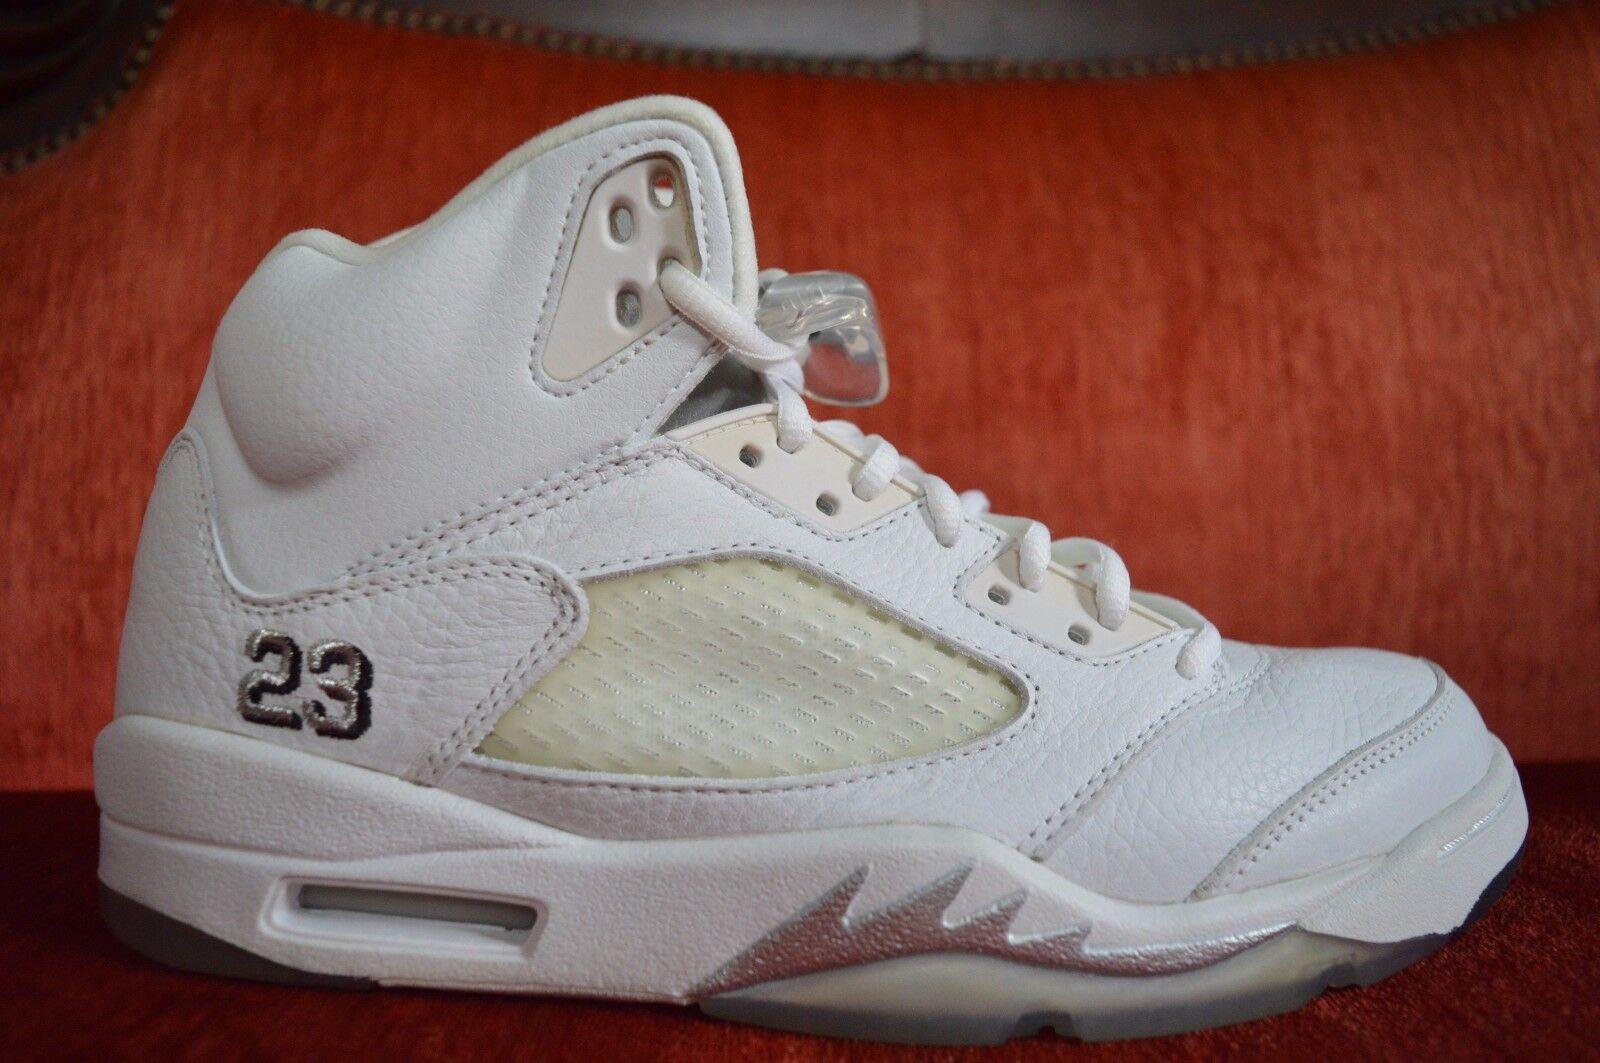 ICYY Nike Air Jordan 5 V Retro 3/4 Hi Size 9.5 White Metallic Silver 136045-101